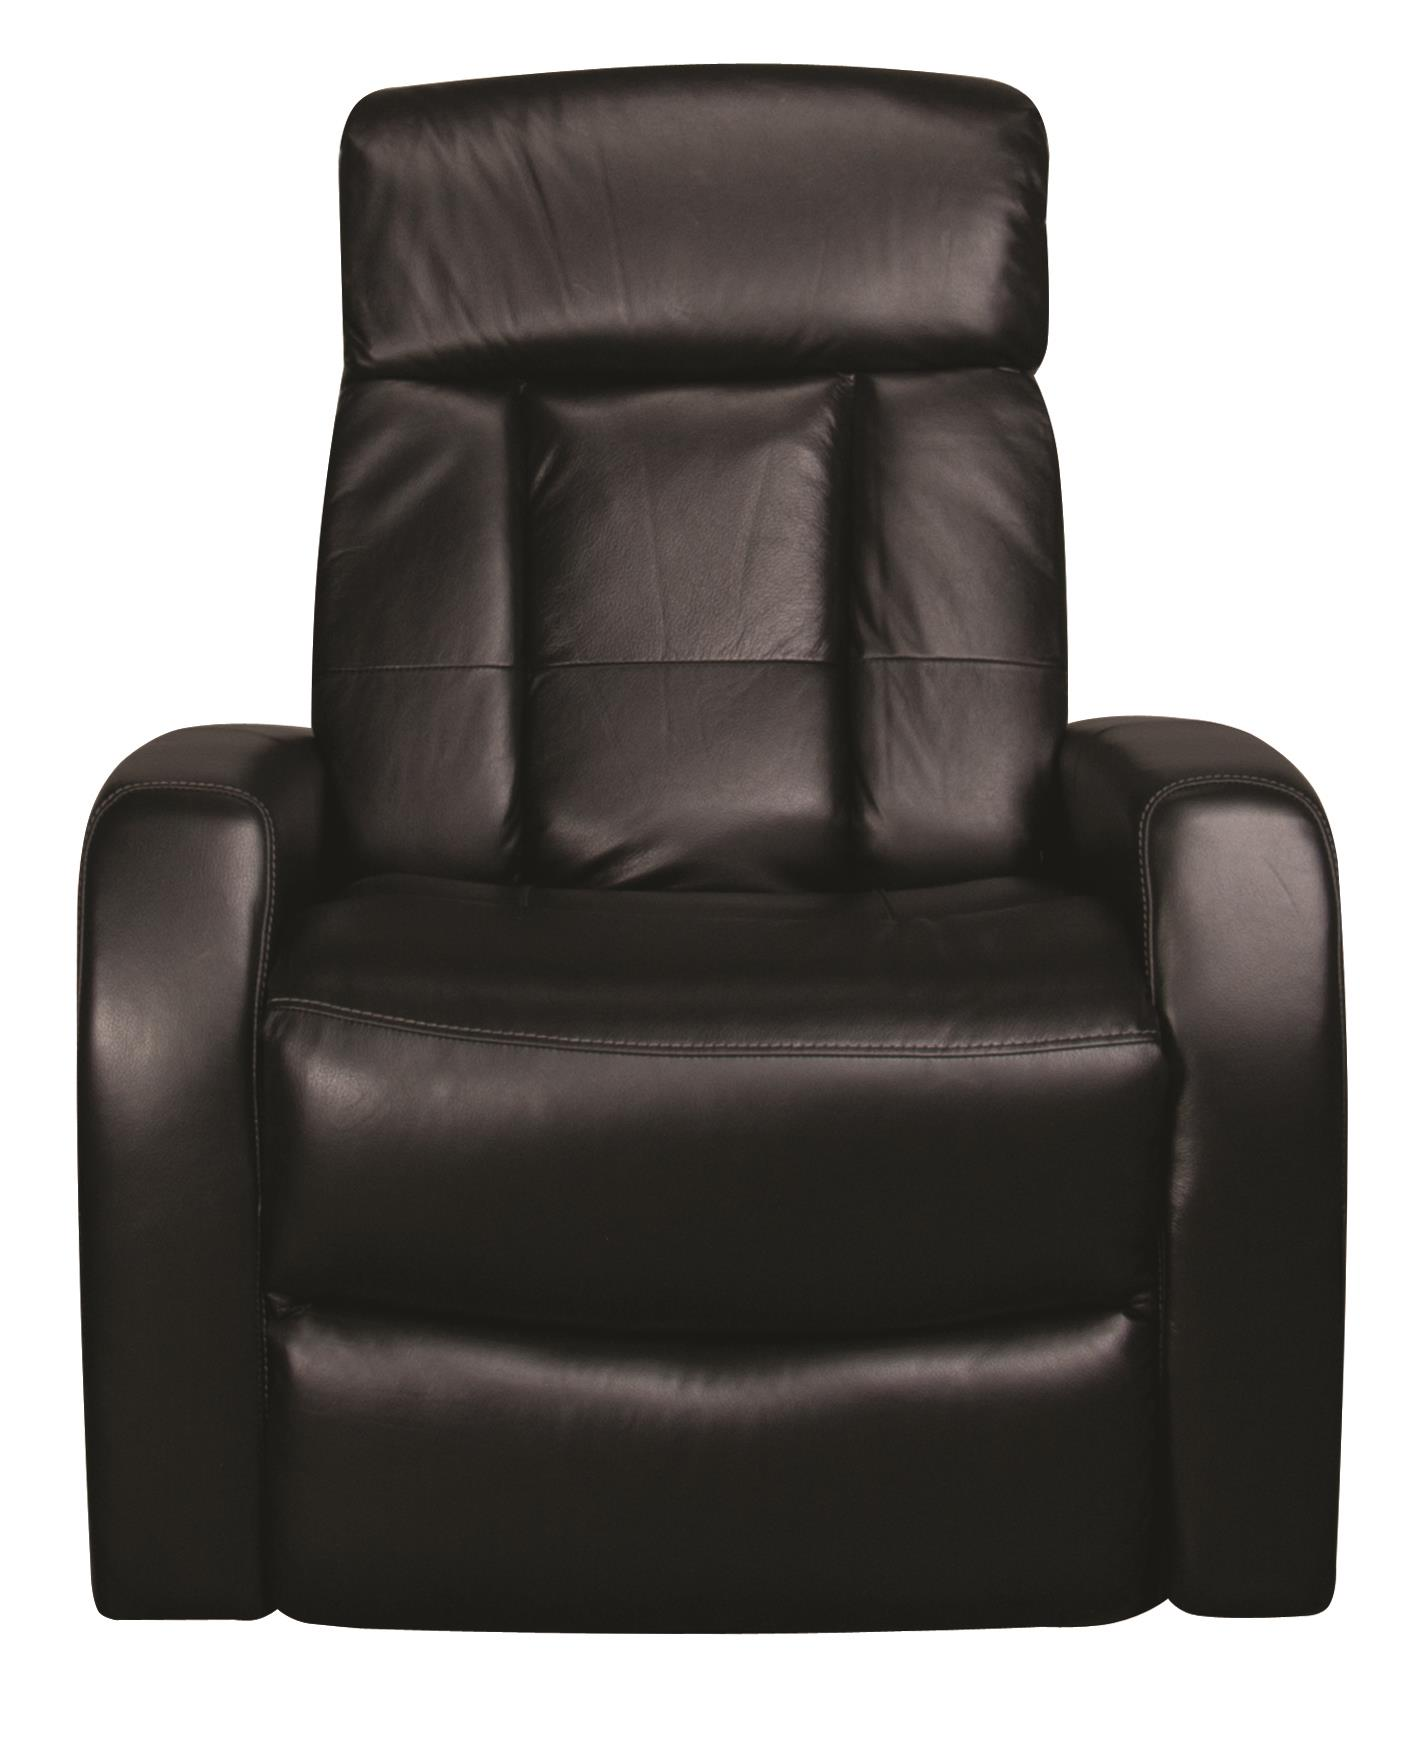 Morris Home Furnishings Dalton  Dalton PWR Leather-Match* Swivel Recliner - Item Number: 578432556